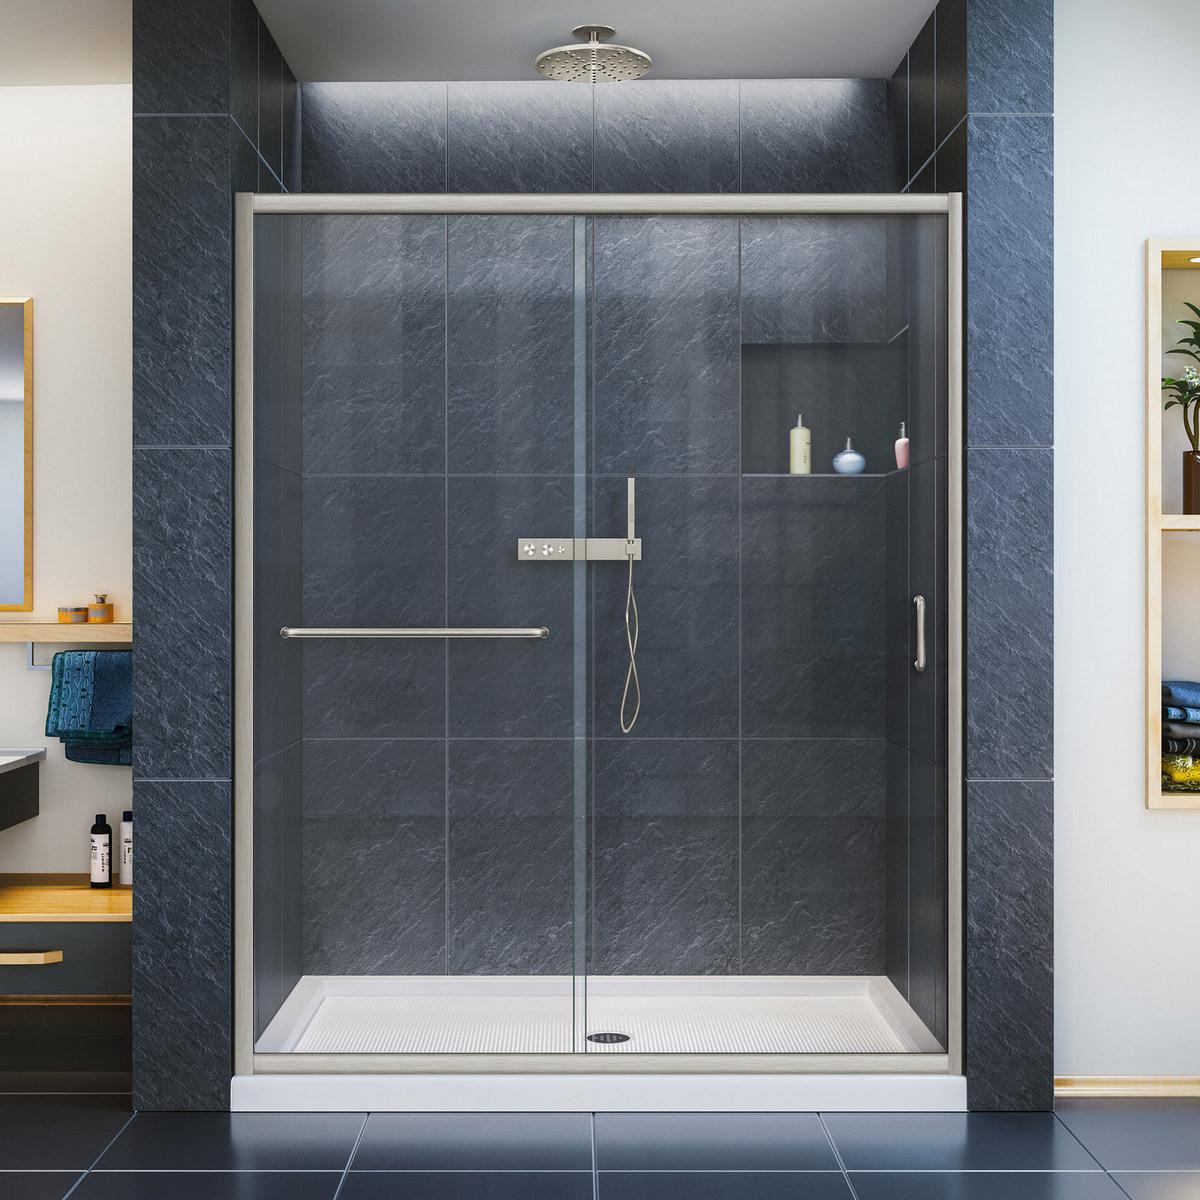 Dreamline Clear Sliding Shower Door Brushed Nickel Right Drain Biscuit Base